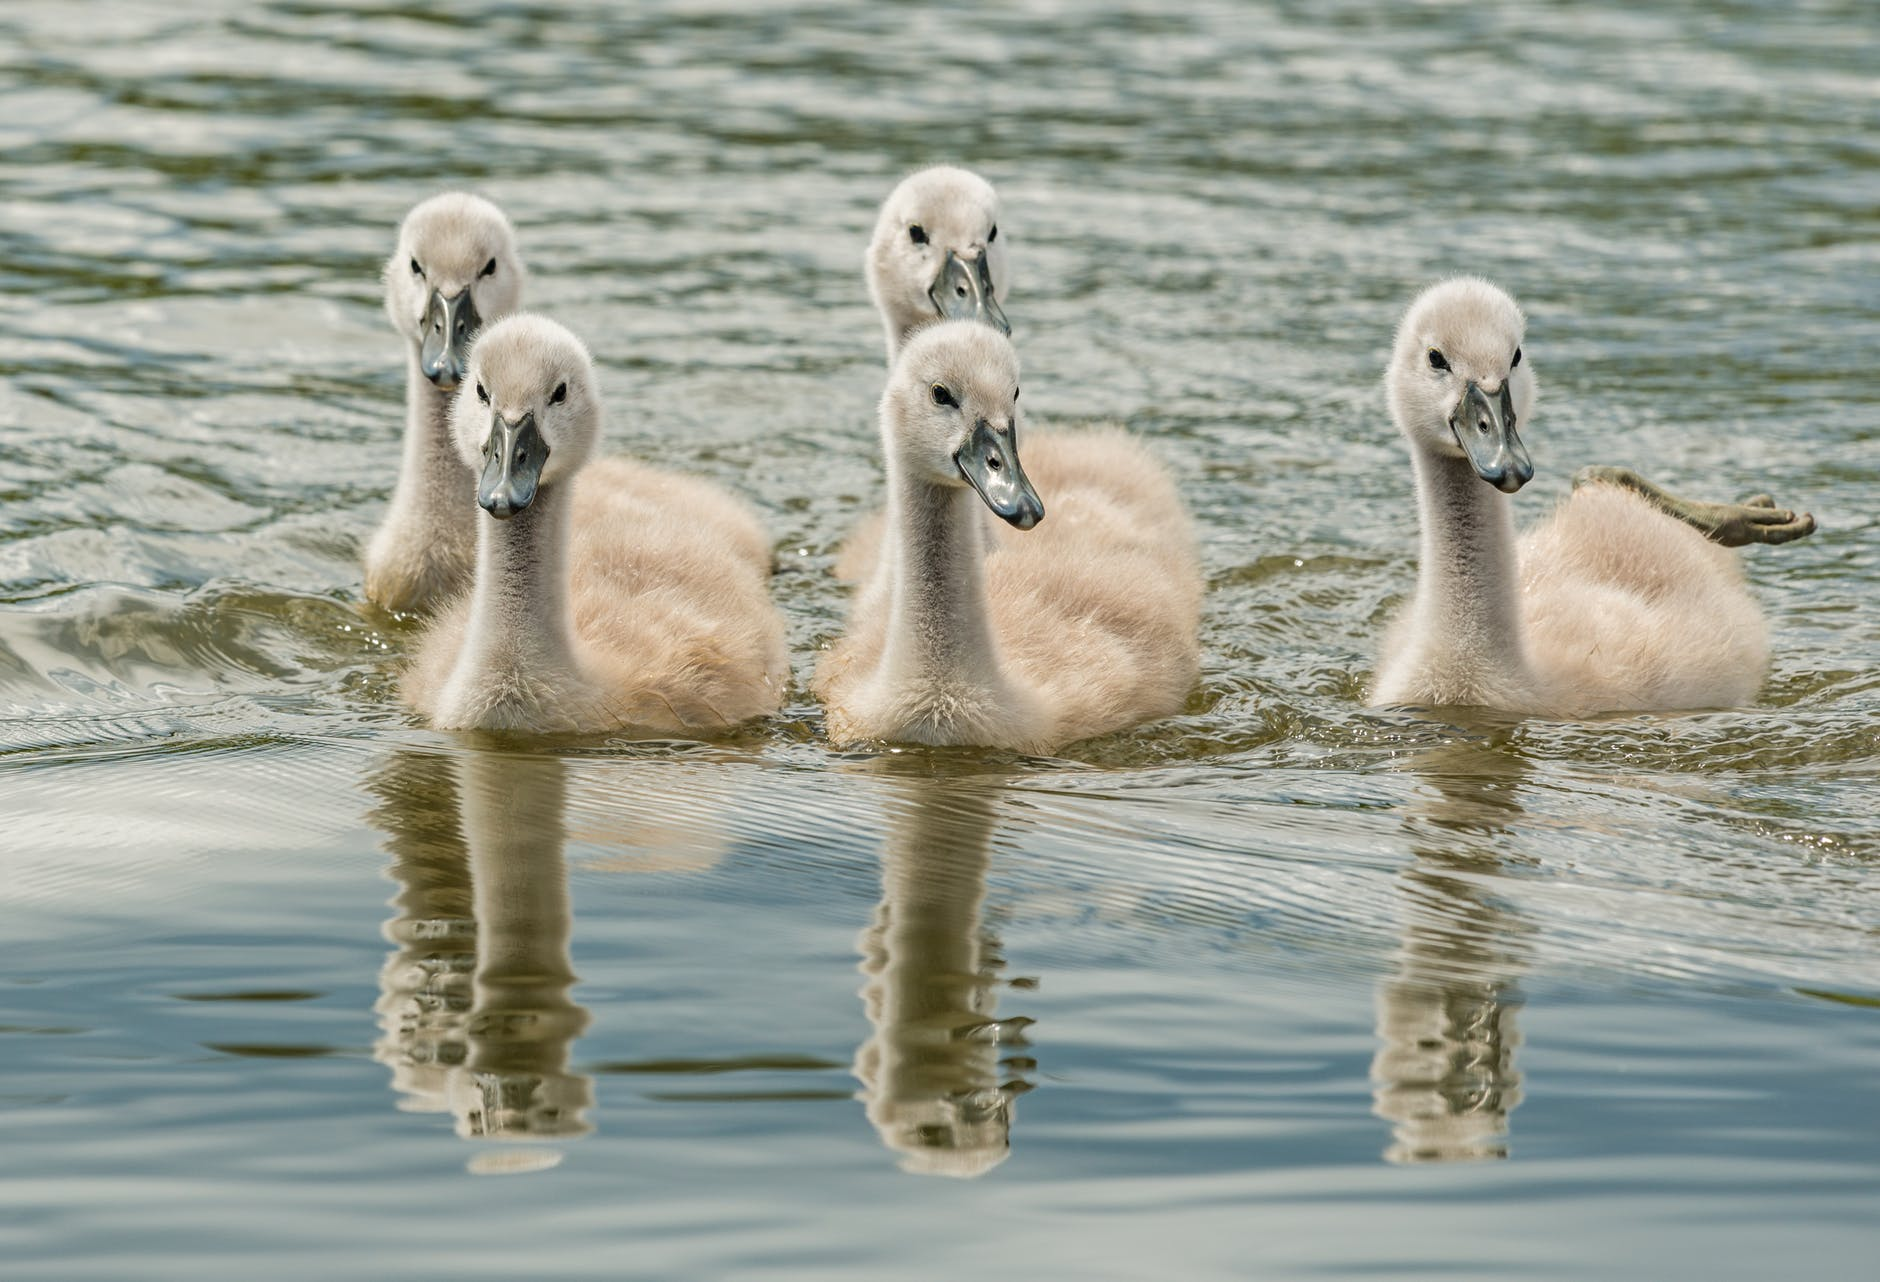 white ducks on water